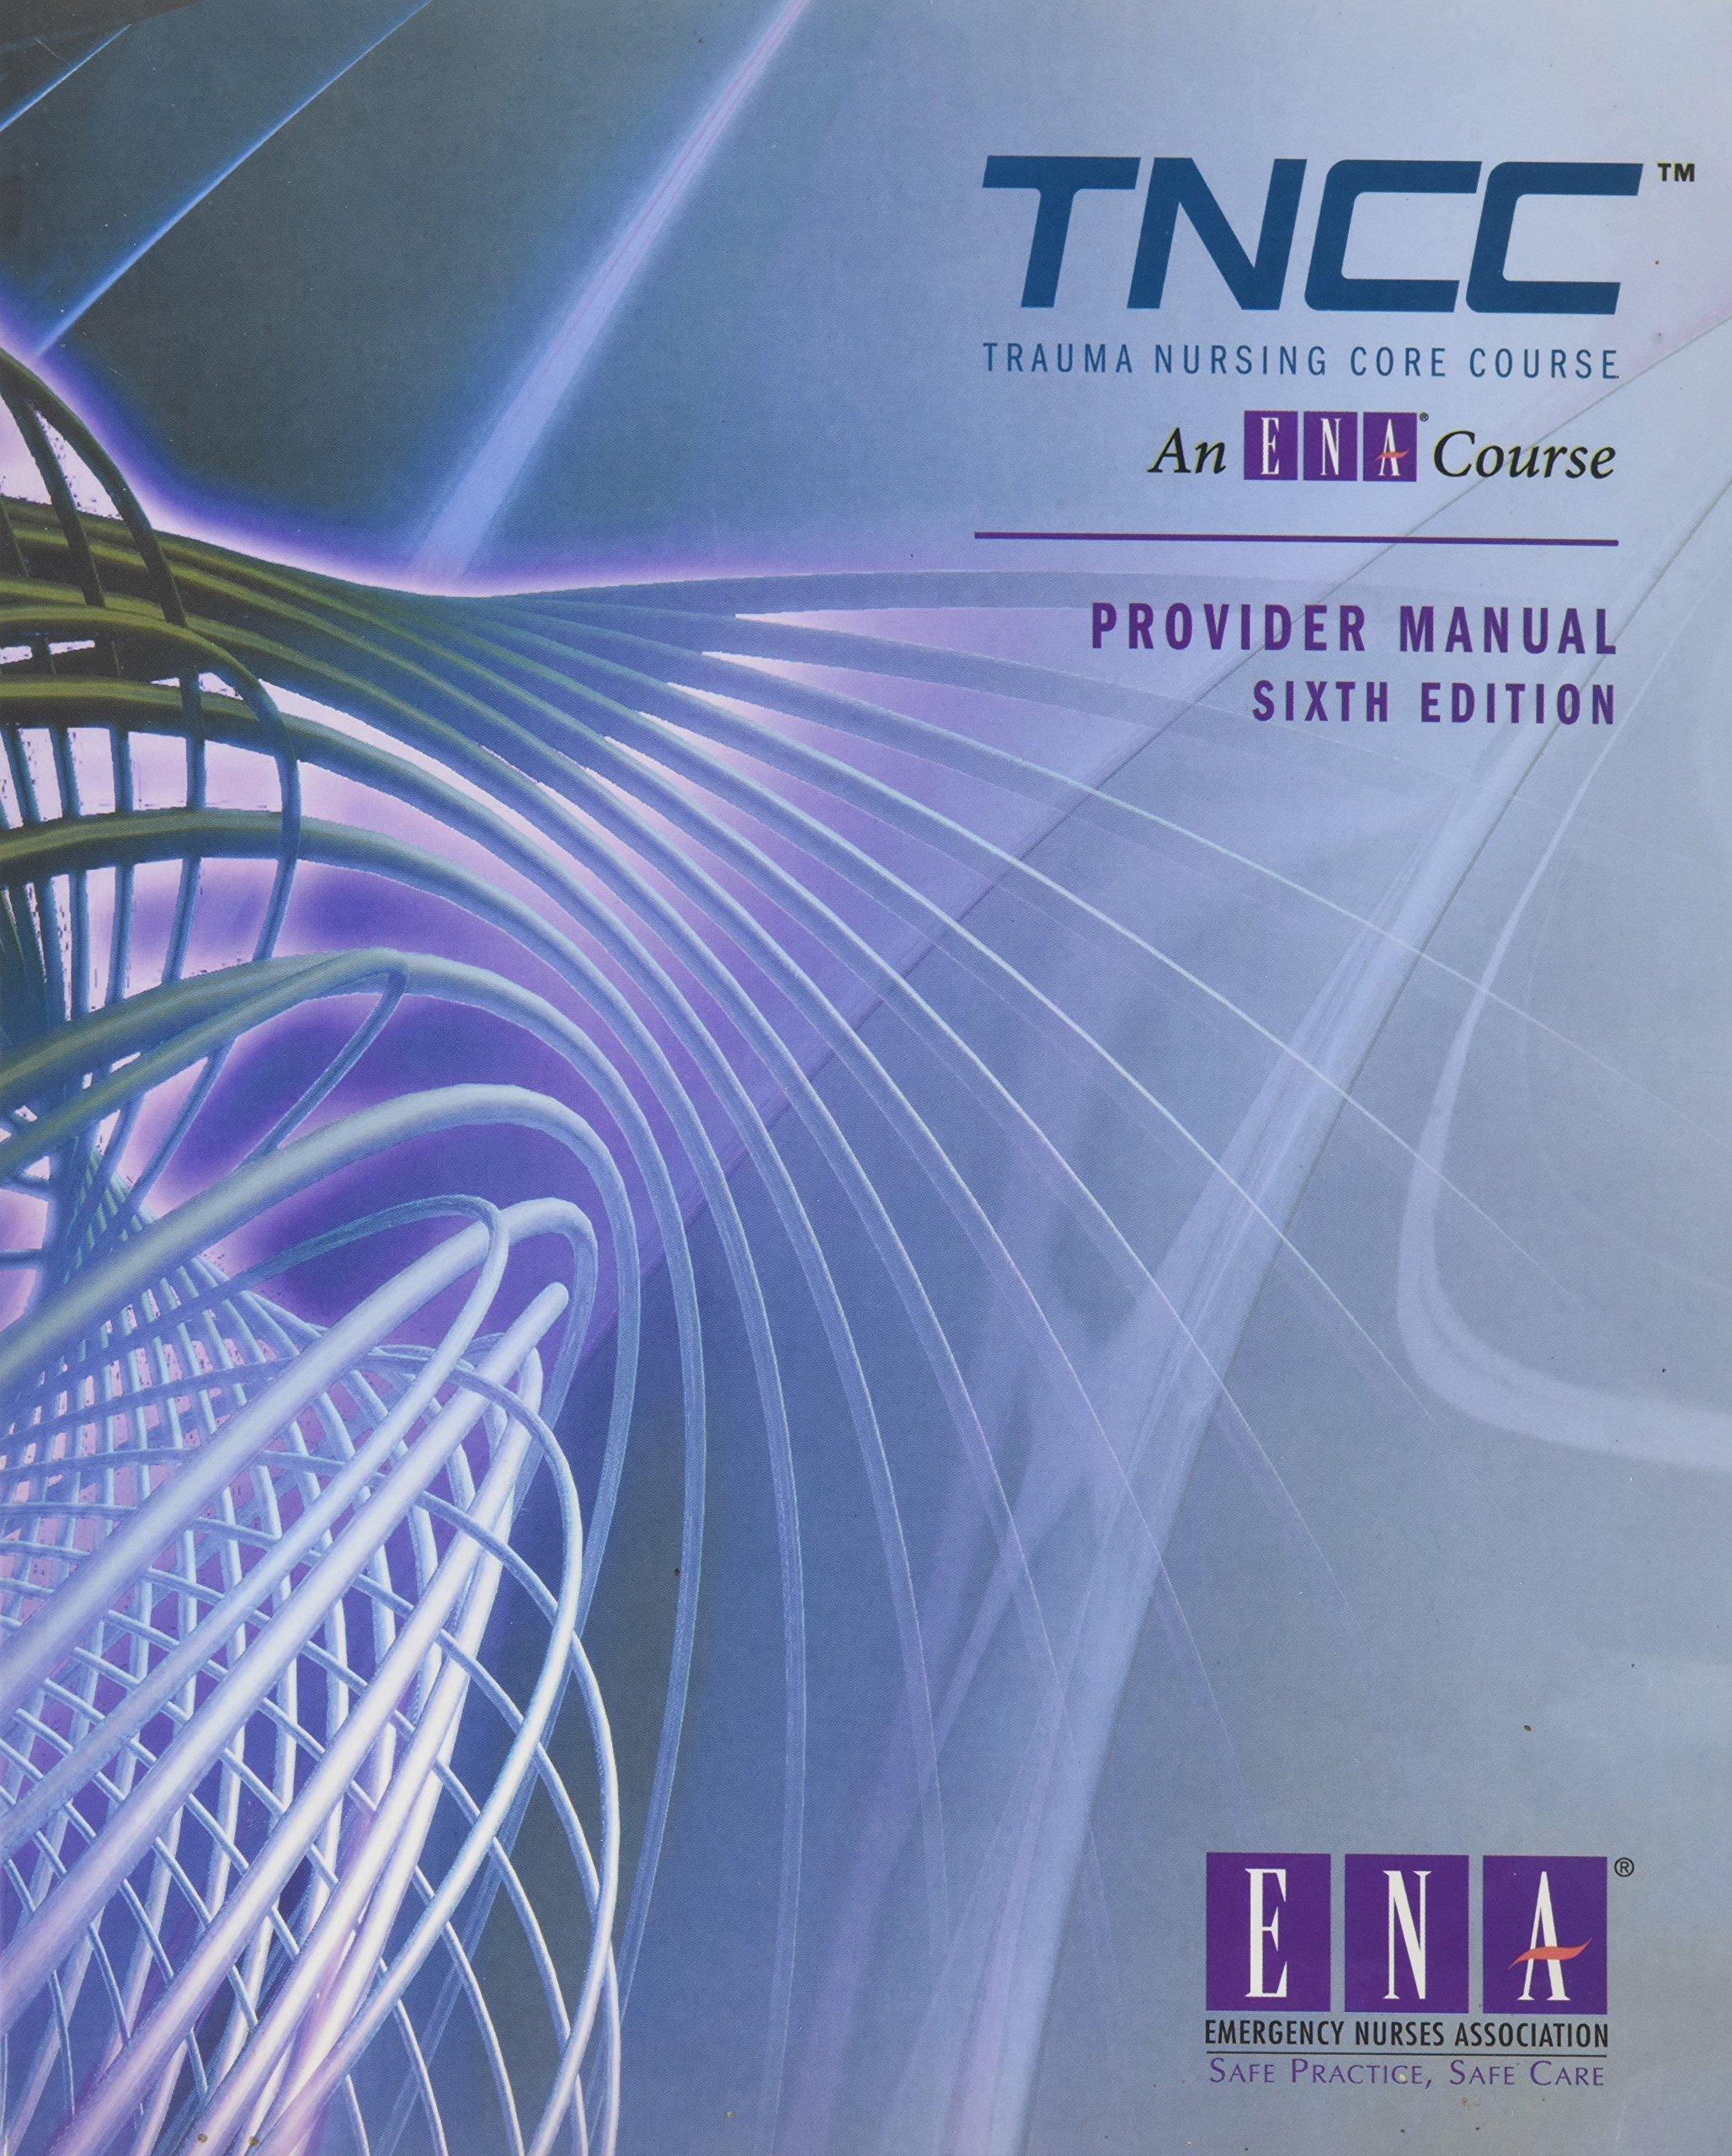 Trauma Nursing Core Course Provider Manual ( TNCC ) 6th edition by  Emergency Nurses Association (2007) Paperback: Amazon.com: Books